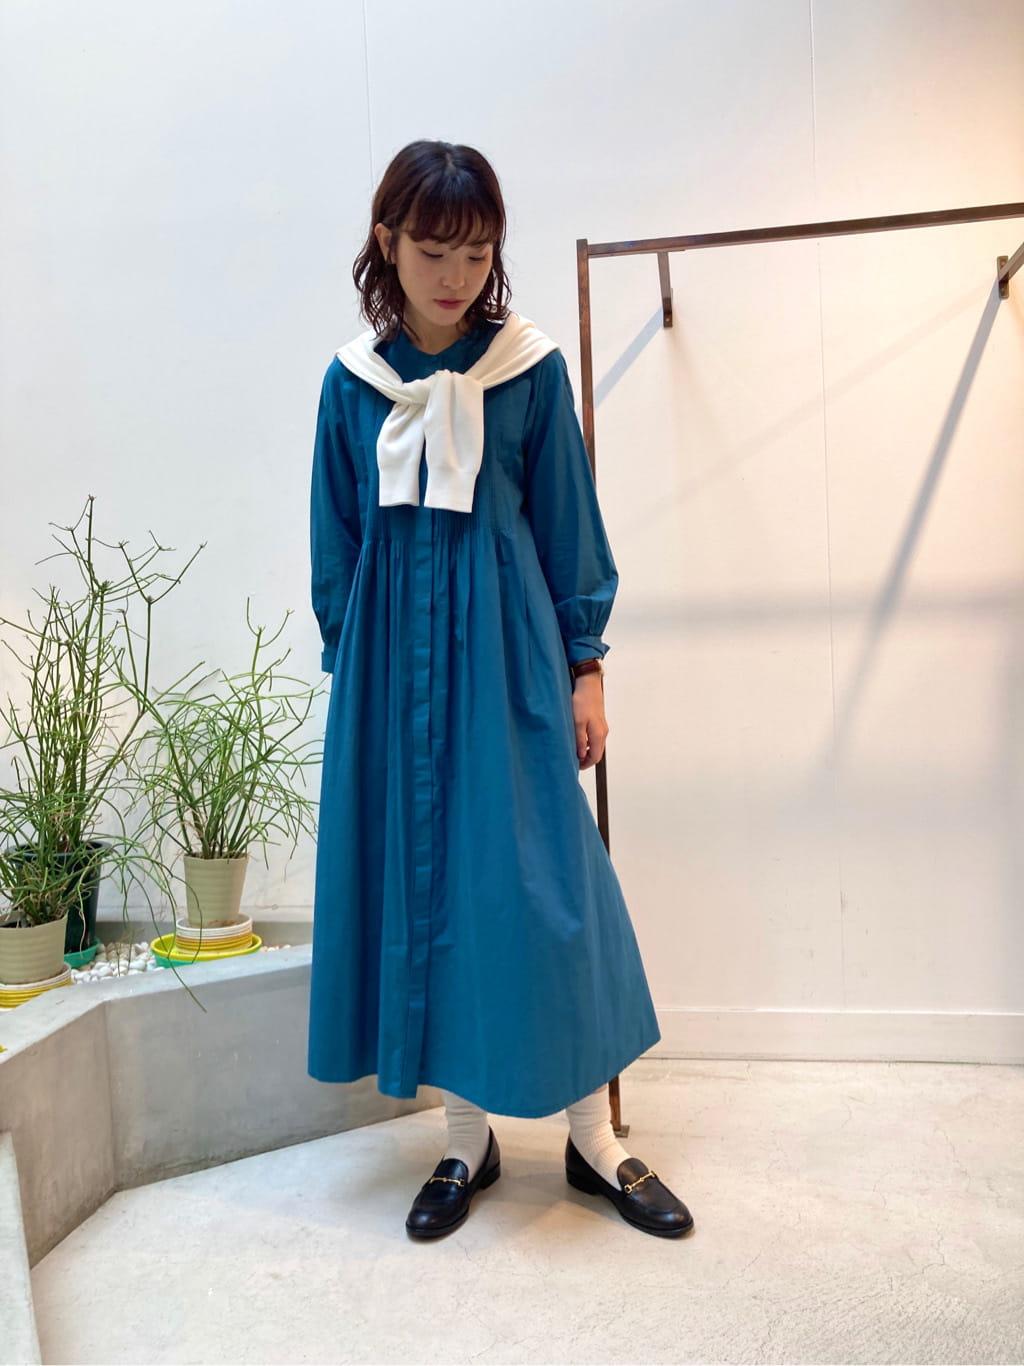 l'atelier du savon 名古屋栄路面 身長:161cm 2021.08.27